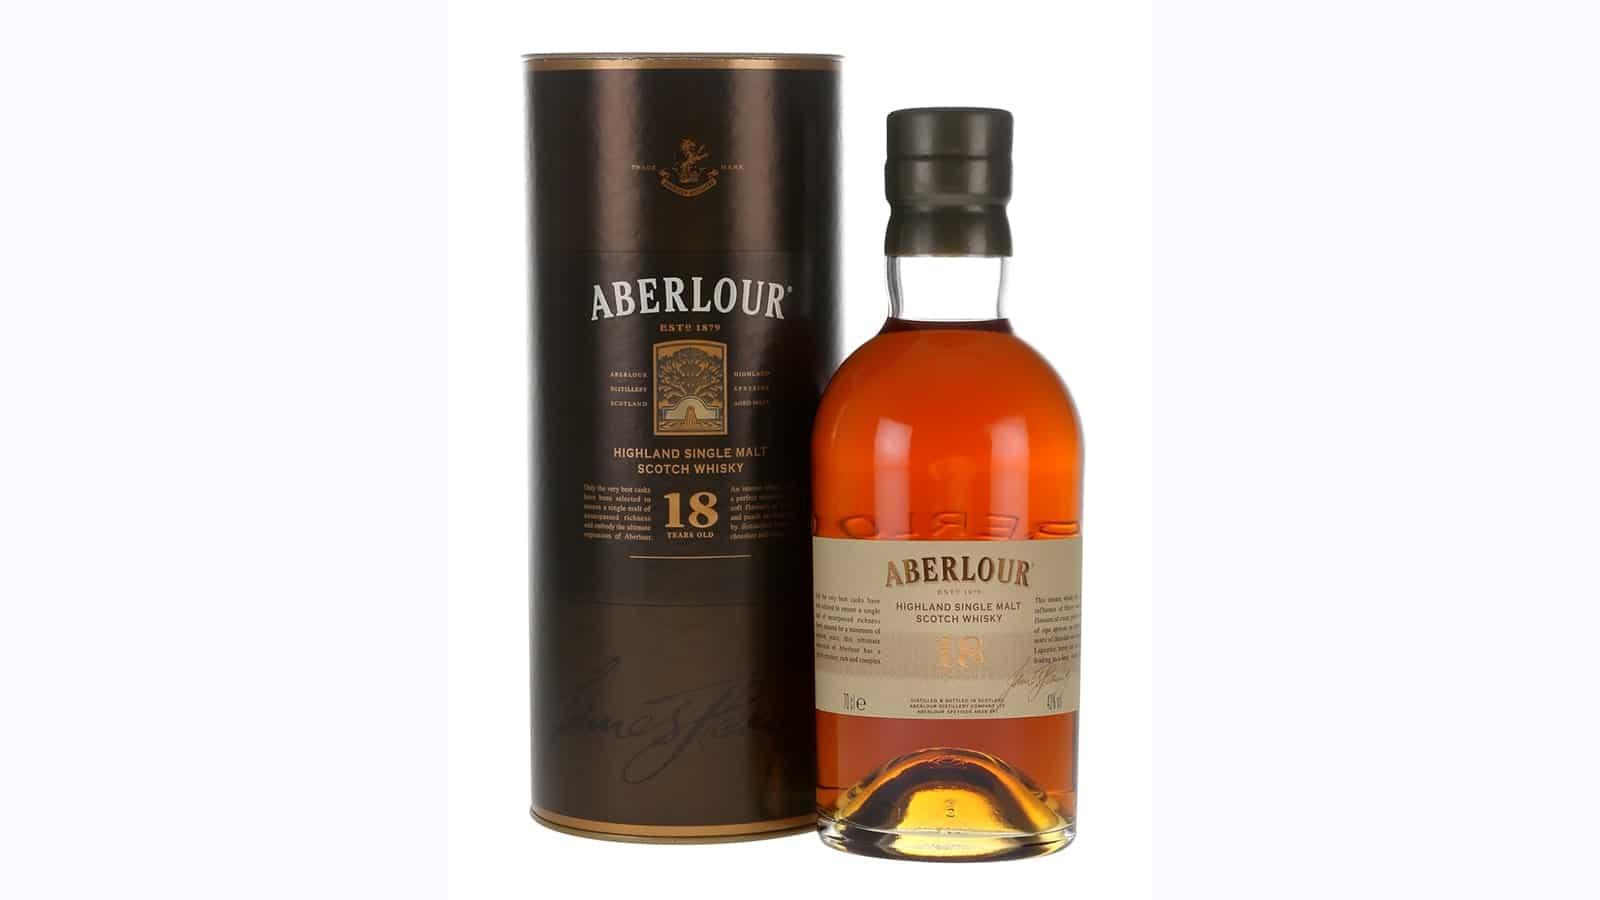 Aberlour 18 years old